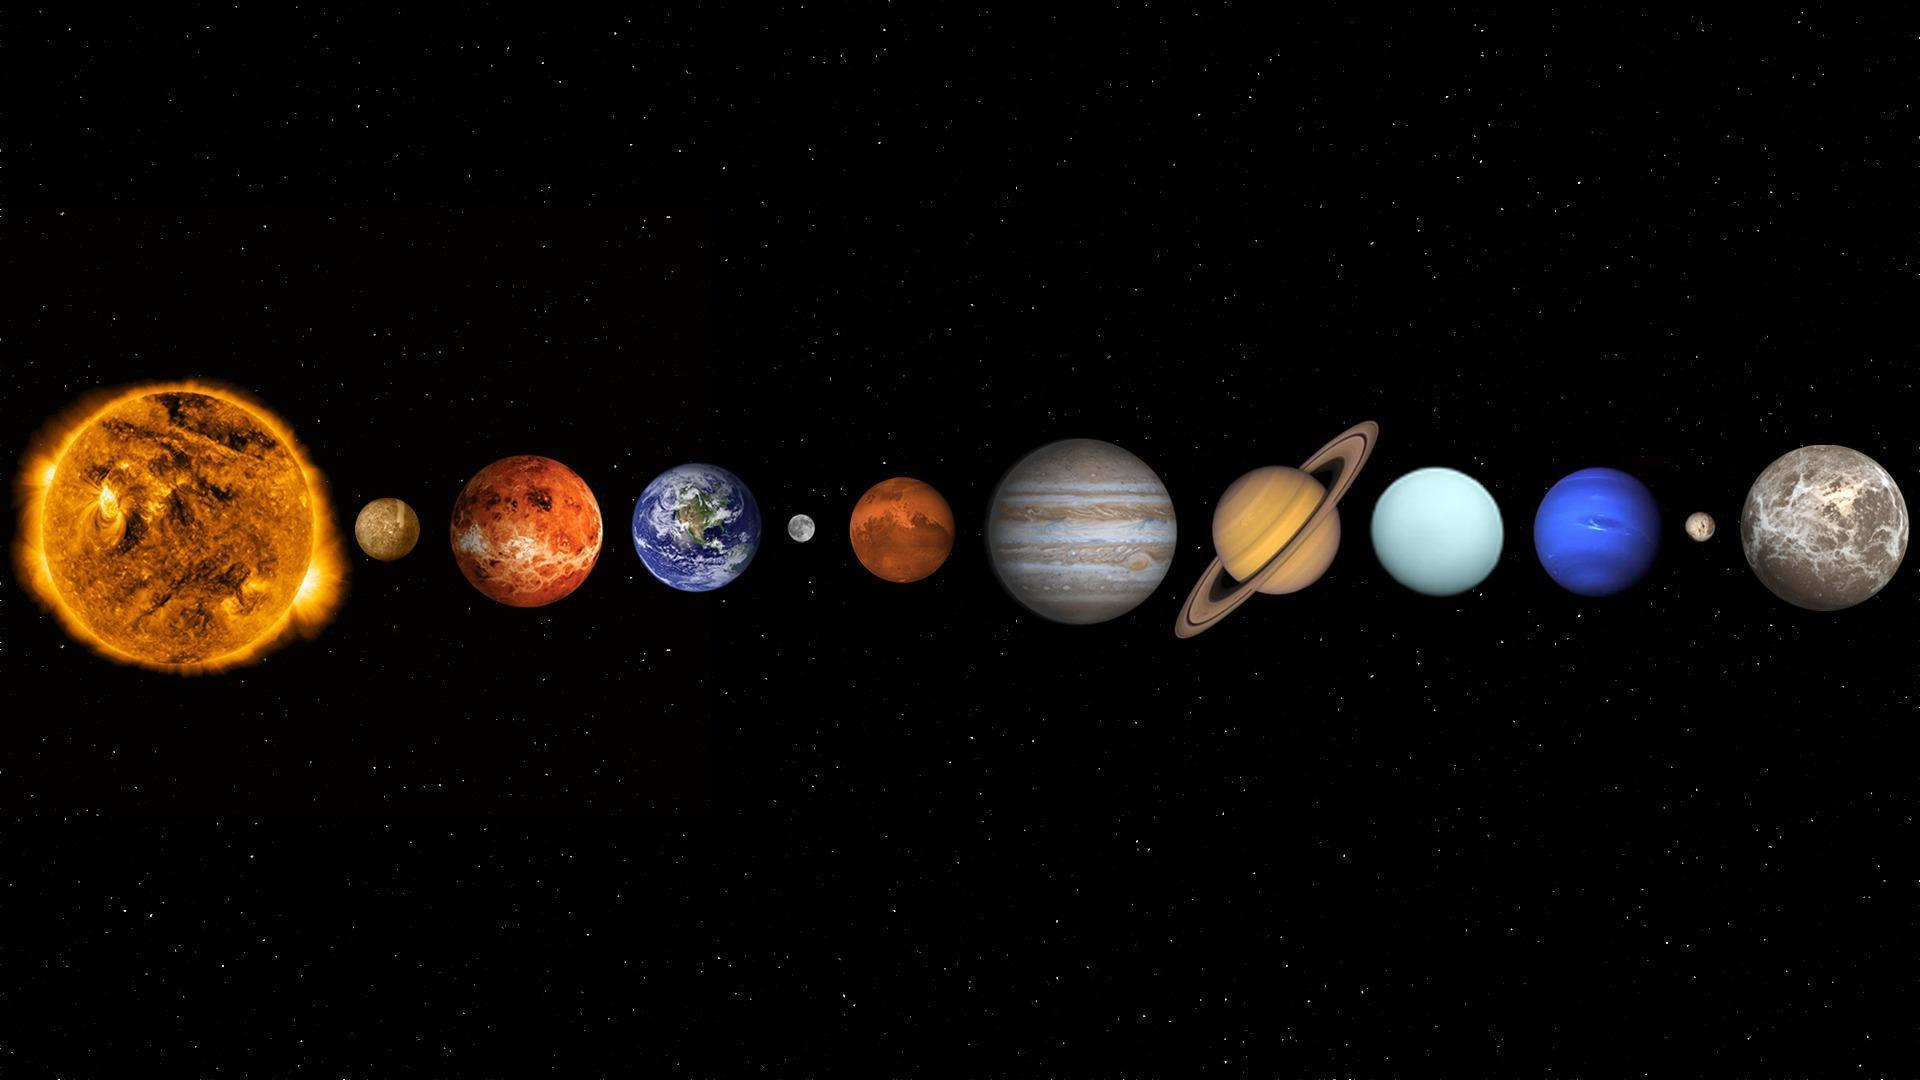 Solar System Background Wallpaper 15440 Baltana